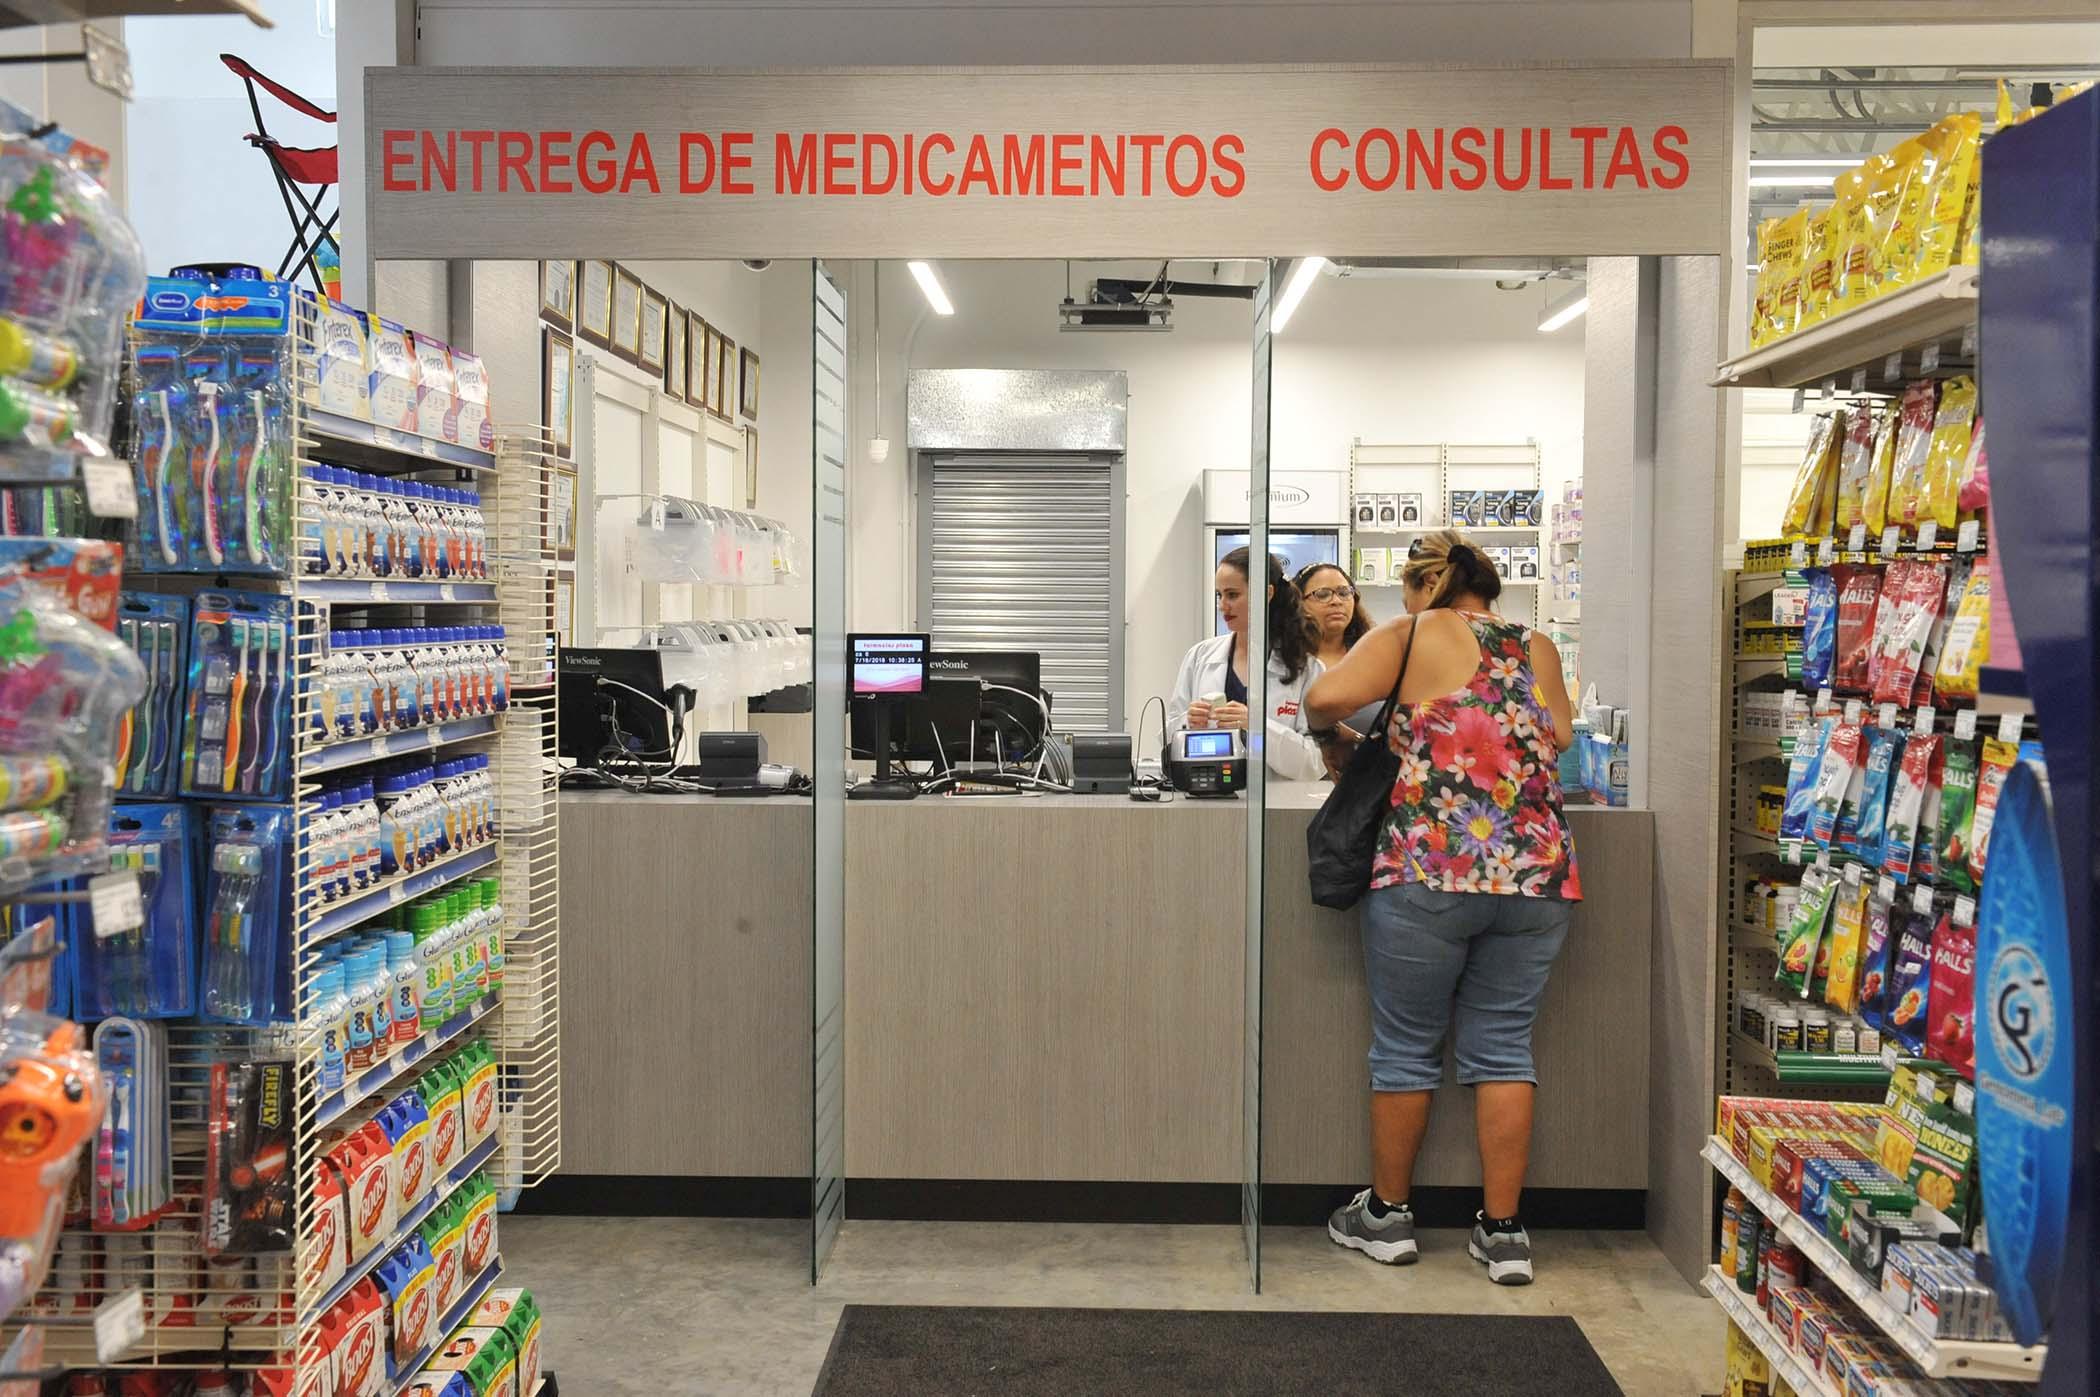 Inauguracion_Farmacias_Plaza-Plaza_del_Sol-8.jpg